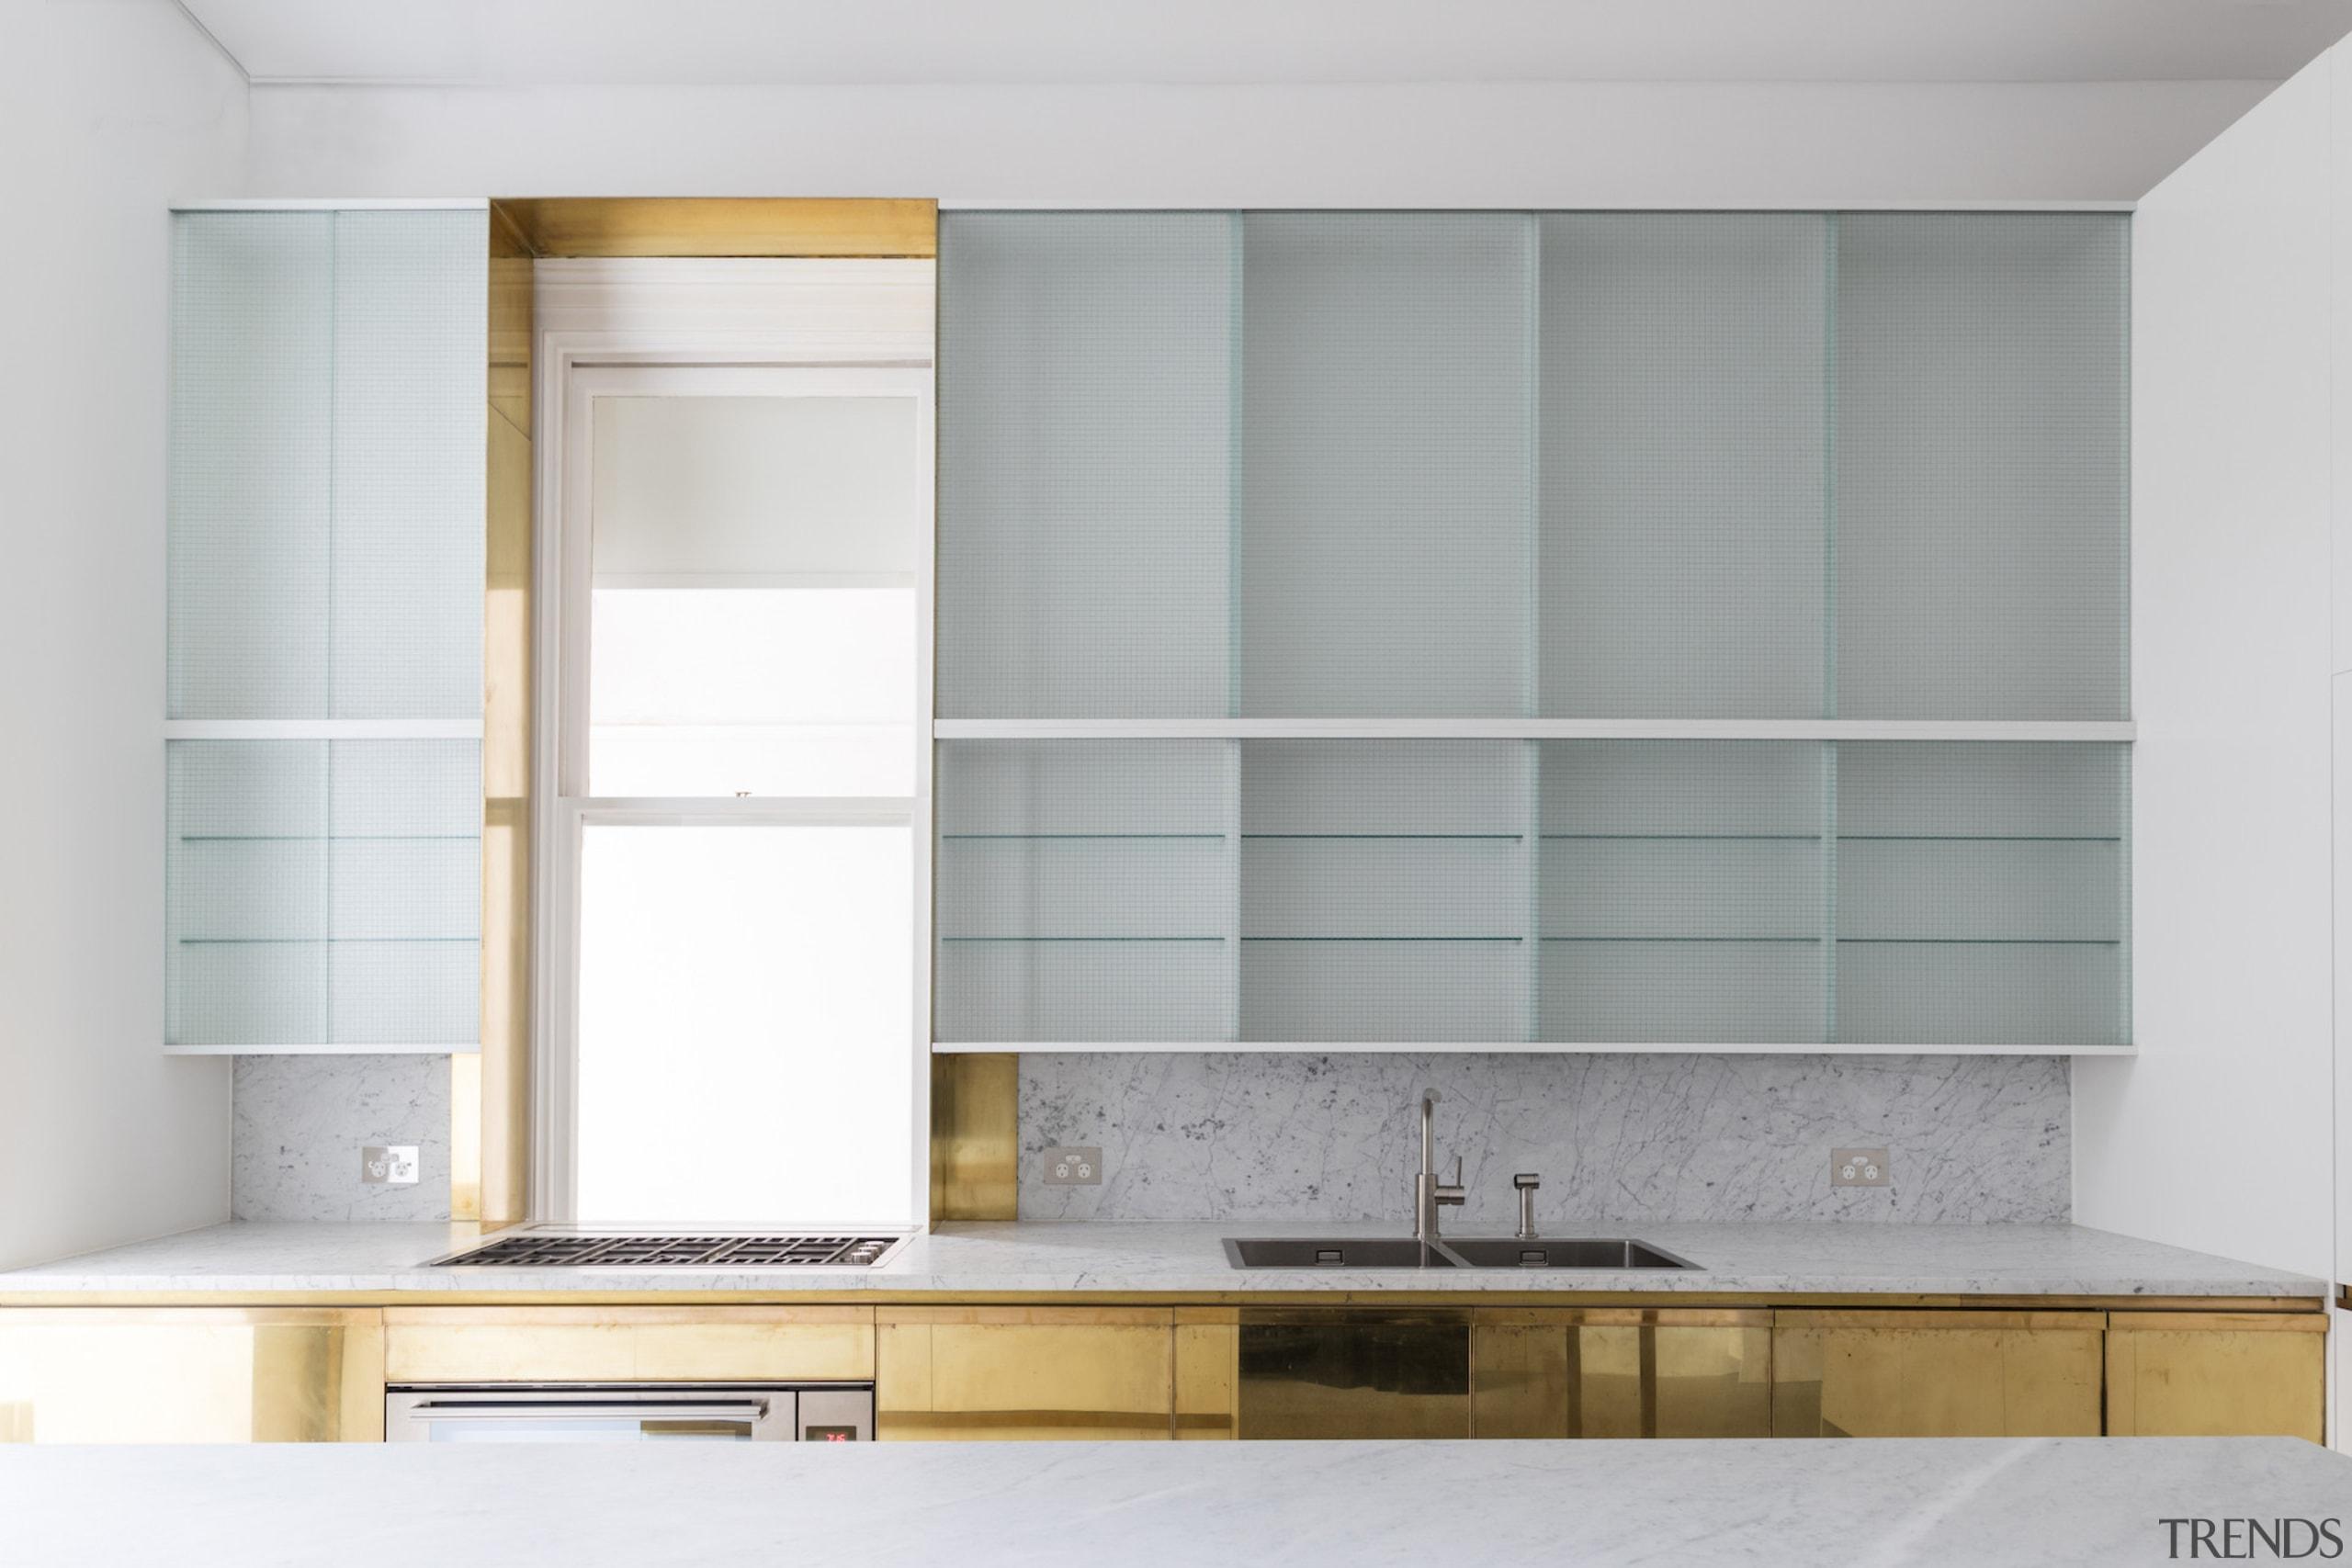 Renato D'Ettorre Architects cabinetry, furniture, interior design, shelf, shelving, wall, gray, white